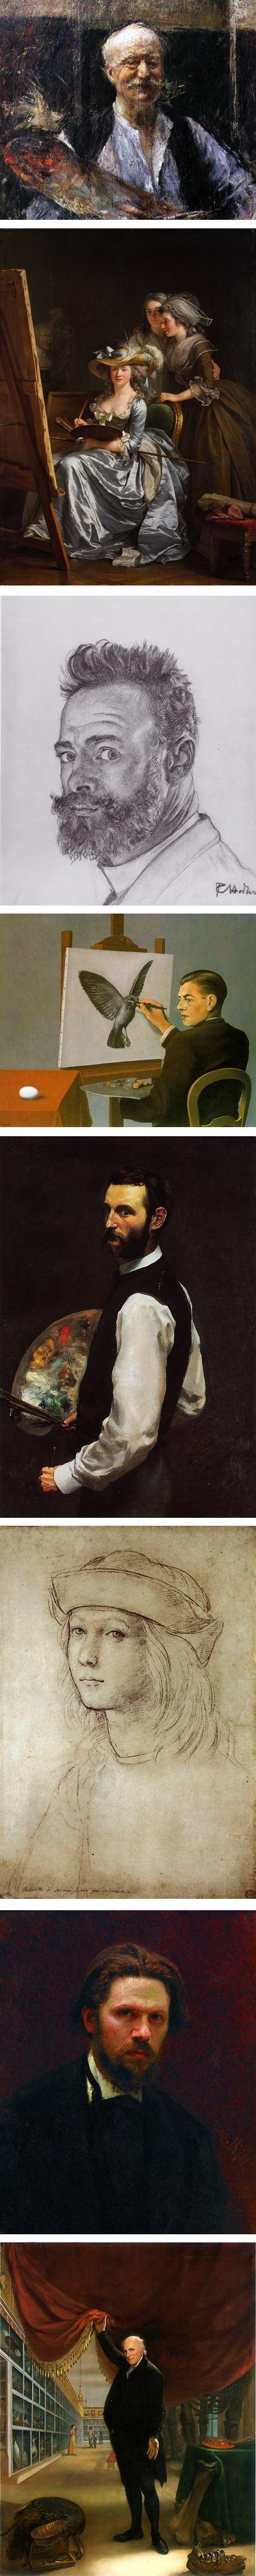 self-portraits: Antonio Mancini, Adelaide Labille-Guiard, Ferdinand Hodler, Rene Magritte, Frederic Bazille. Ivan Kramskoy, Charles Wilson Peale